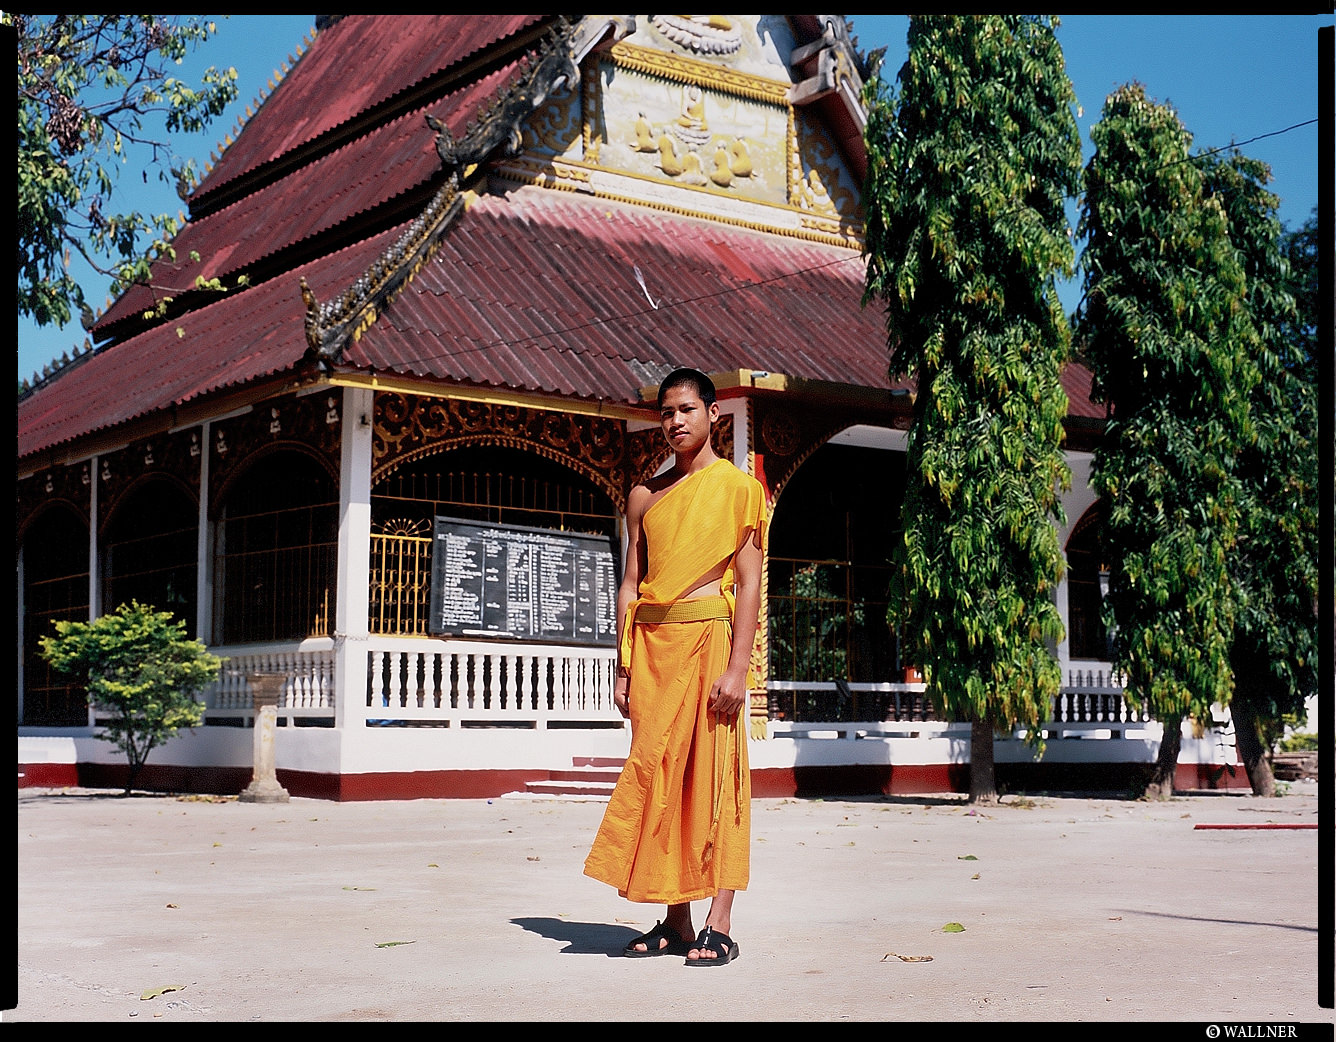 MediumFormatPatrikWallner_Vientiane_LilBrotherShaiLongLOWQ